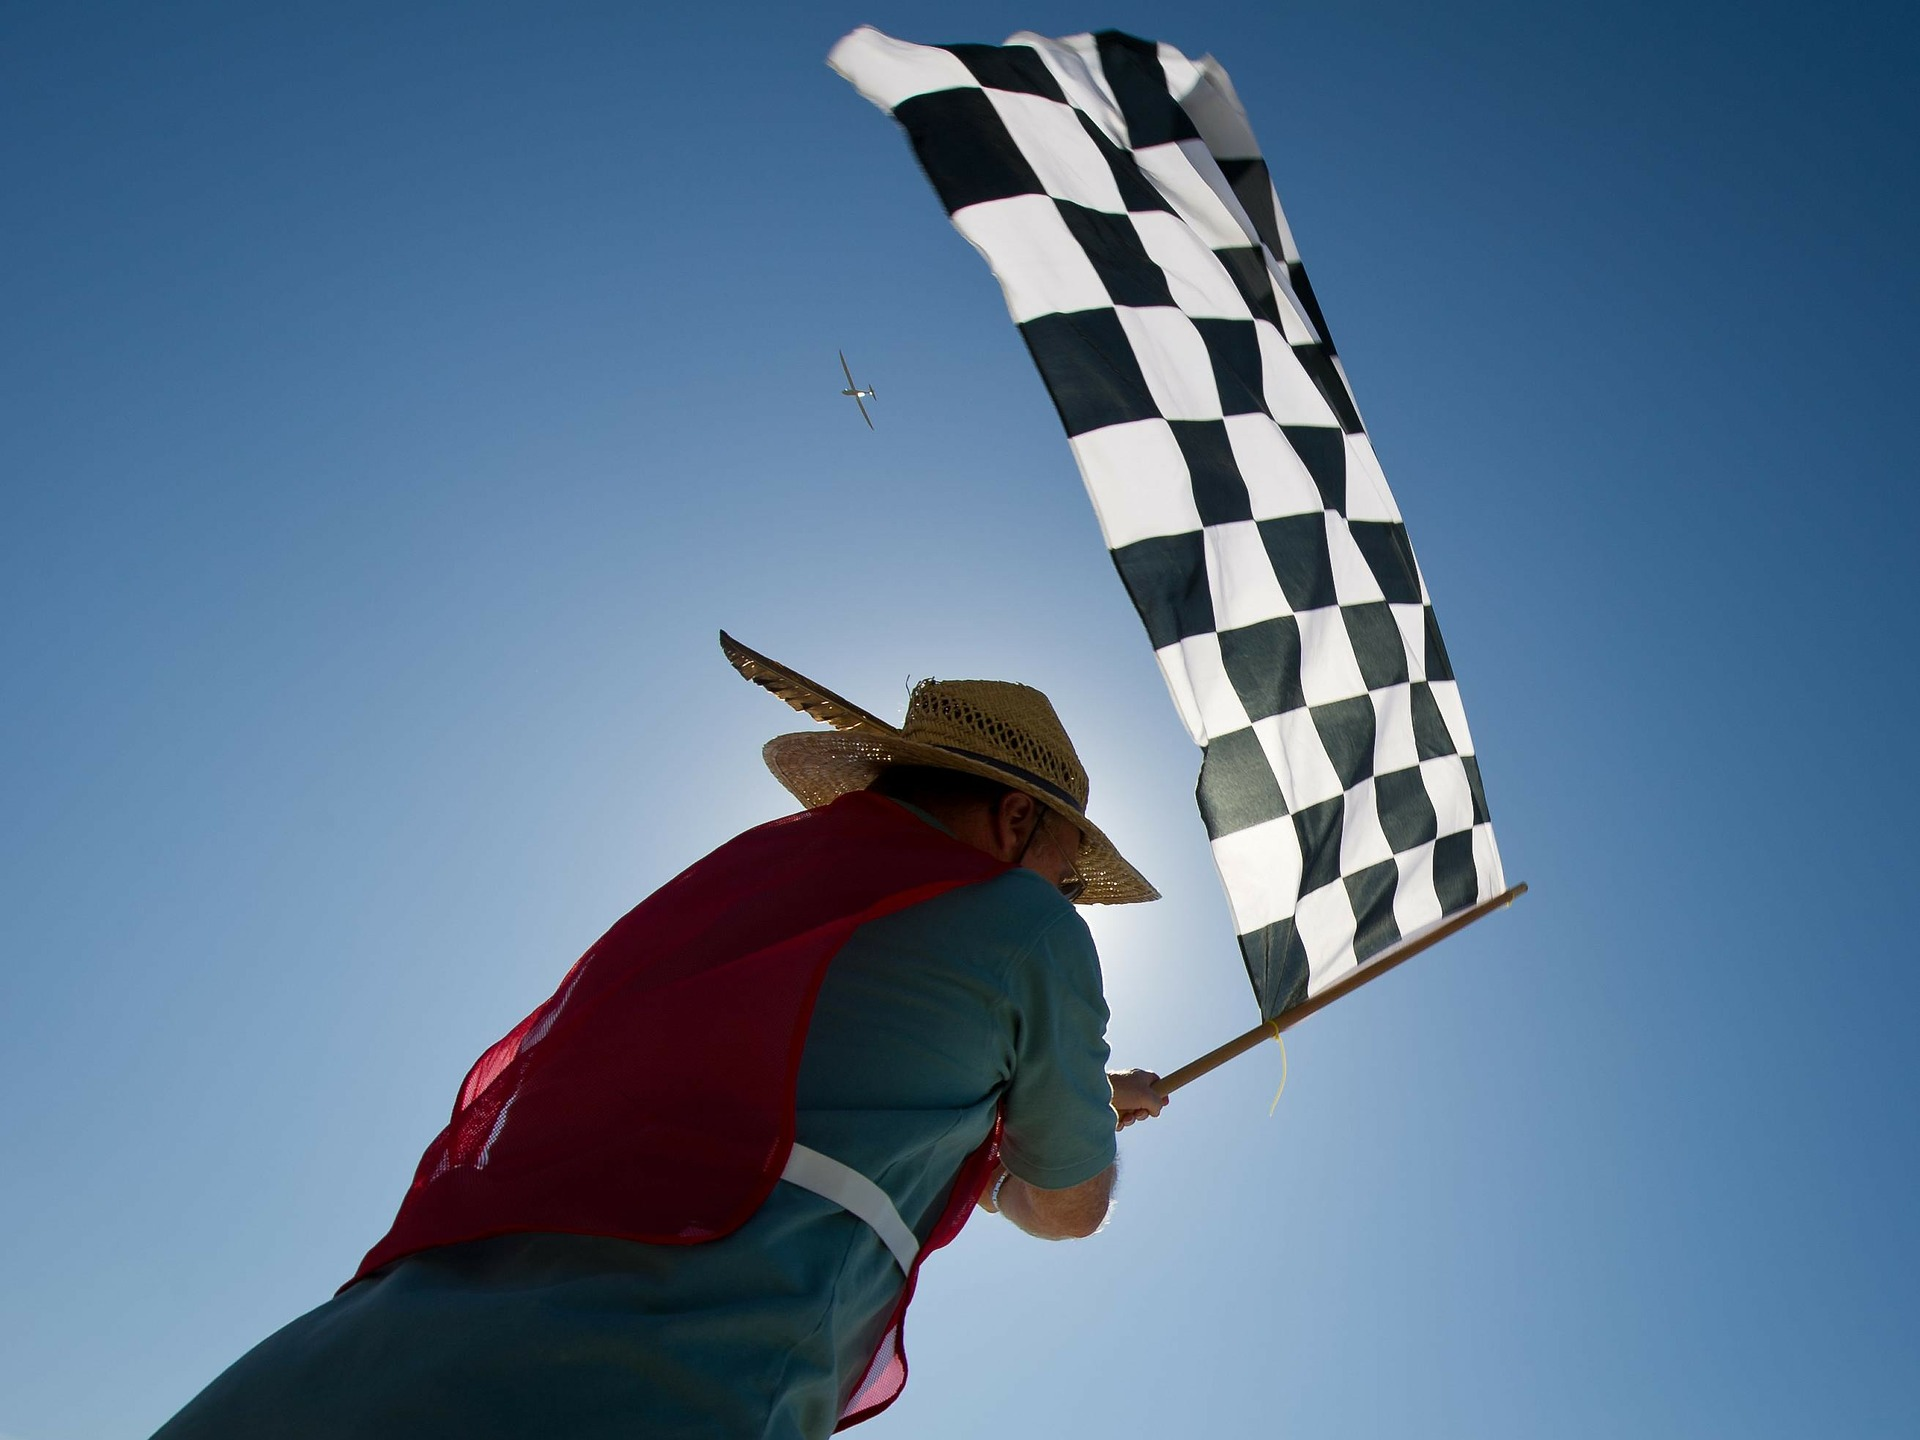 race-92193_1920.jpg